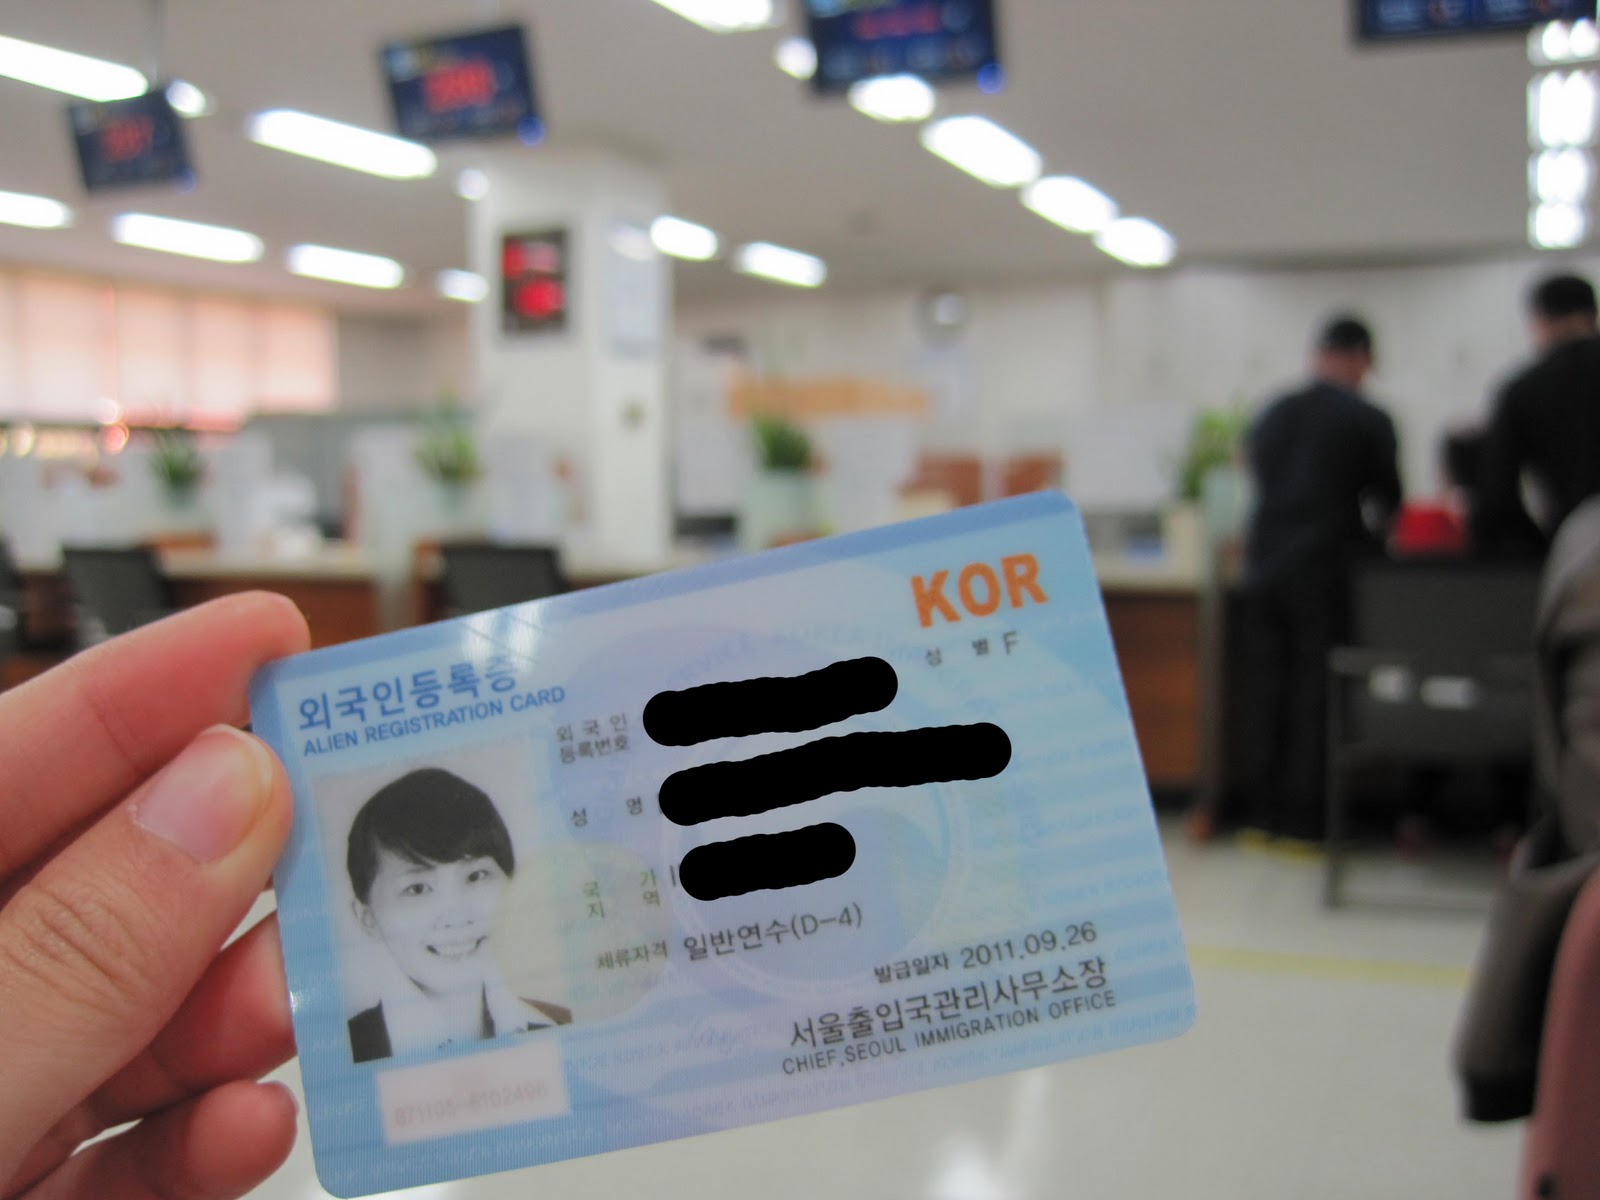 D-4 Visa General trainee (일반연수) - Hiexpat Korea